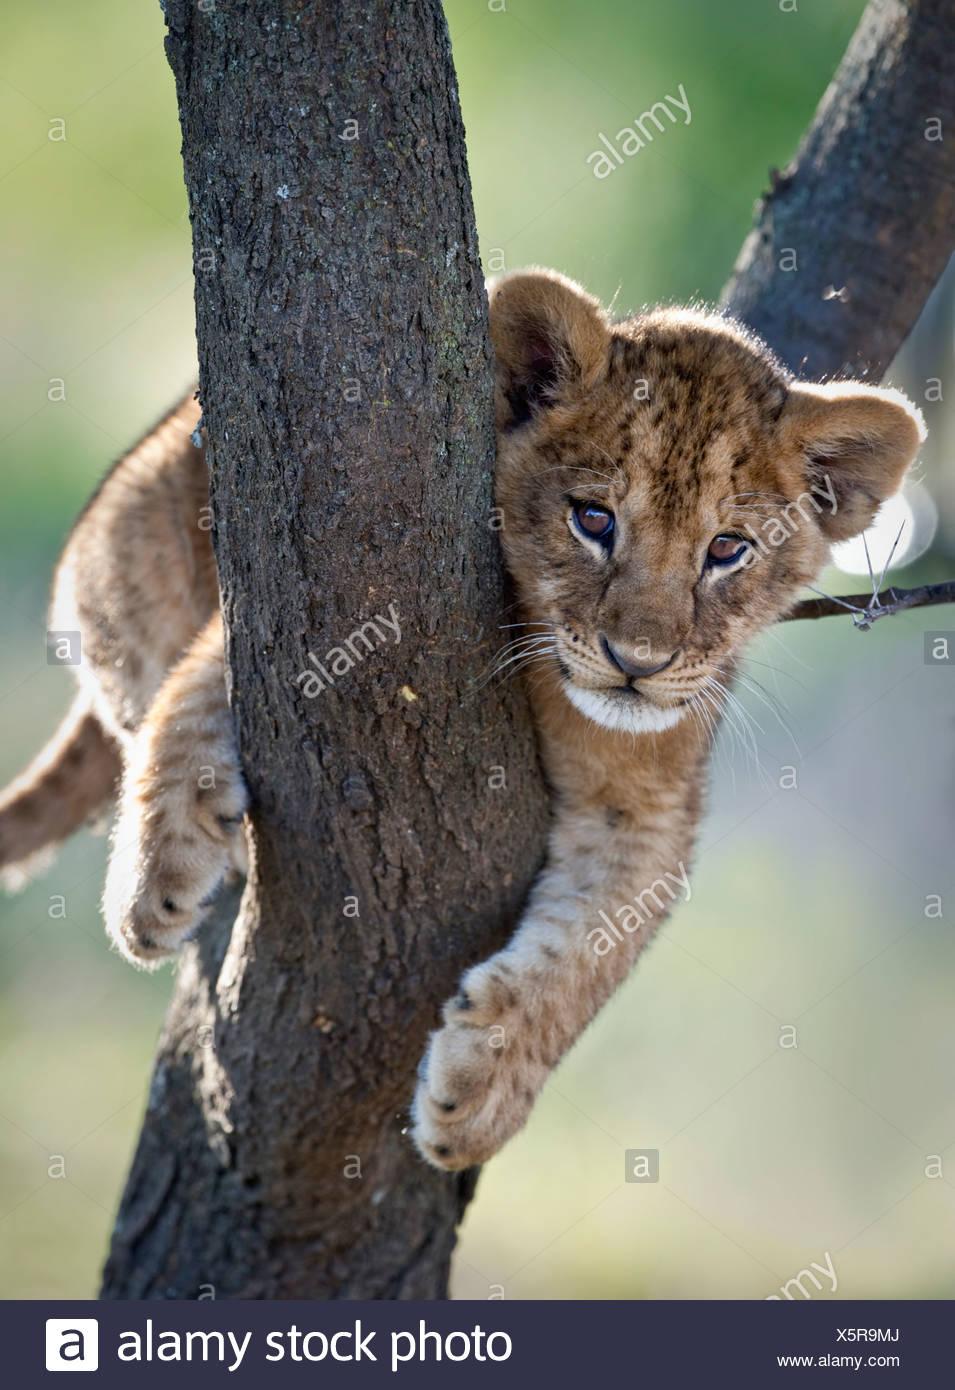 Lion cub about 3 months old, climbing a tree. Near Ndutu, Ngorongoro Conservation Area / Serengeti National Park, Tanzania. - Stock Image